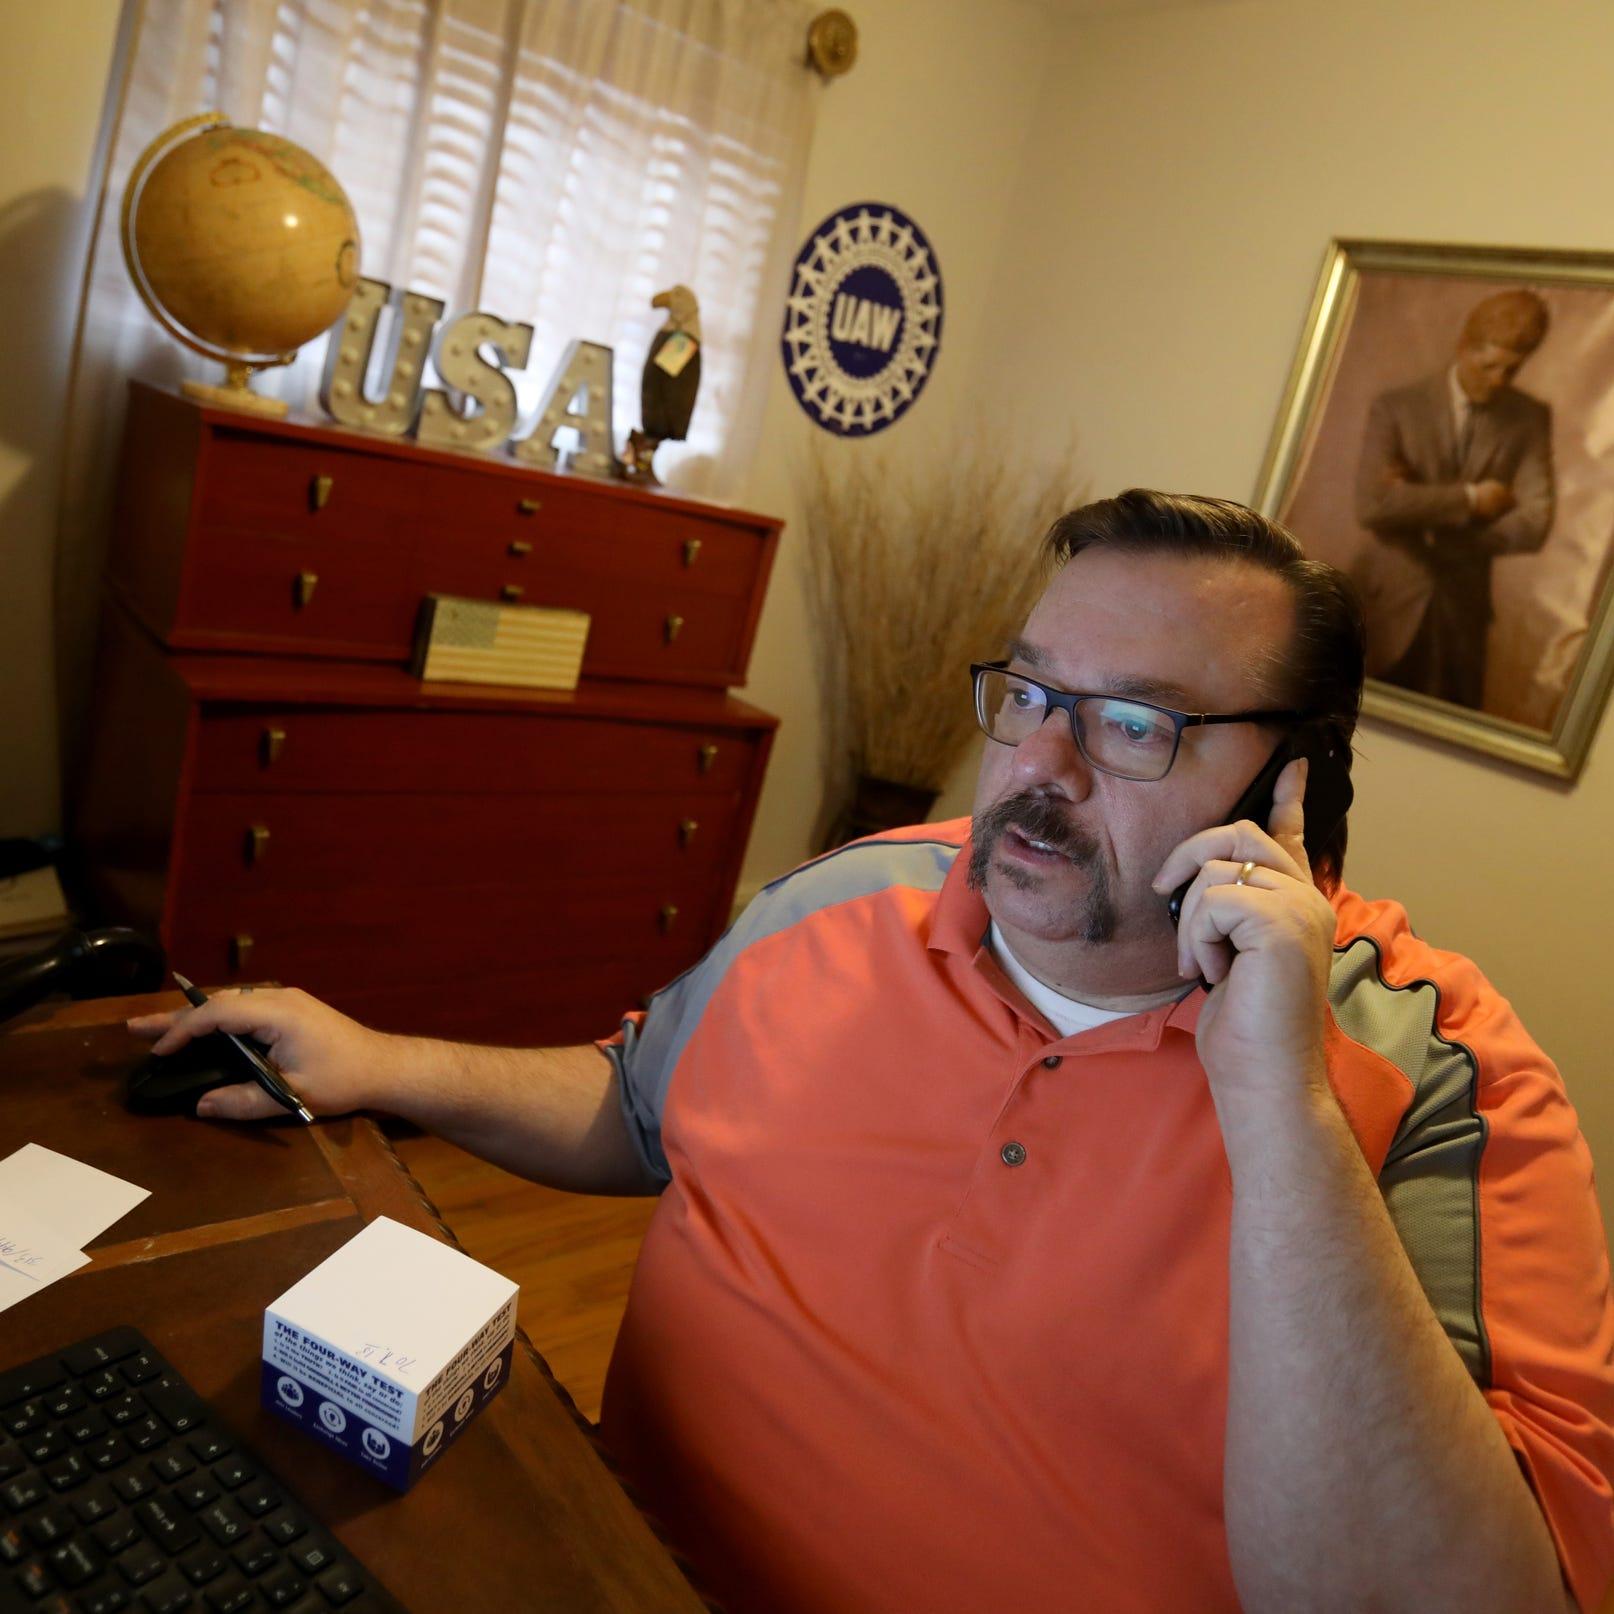 Taylor Treasurer Ed Bourassa at hearing: I aim to keep city job